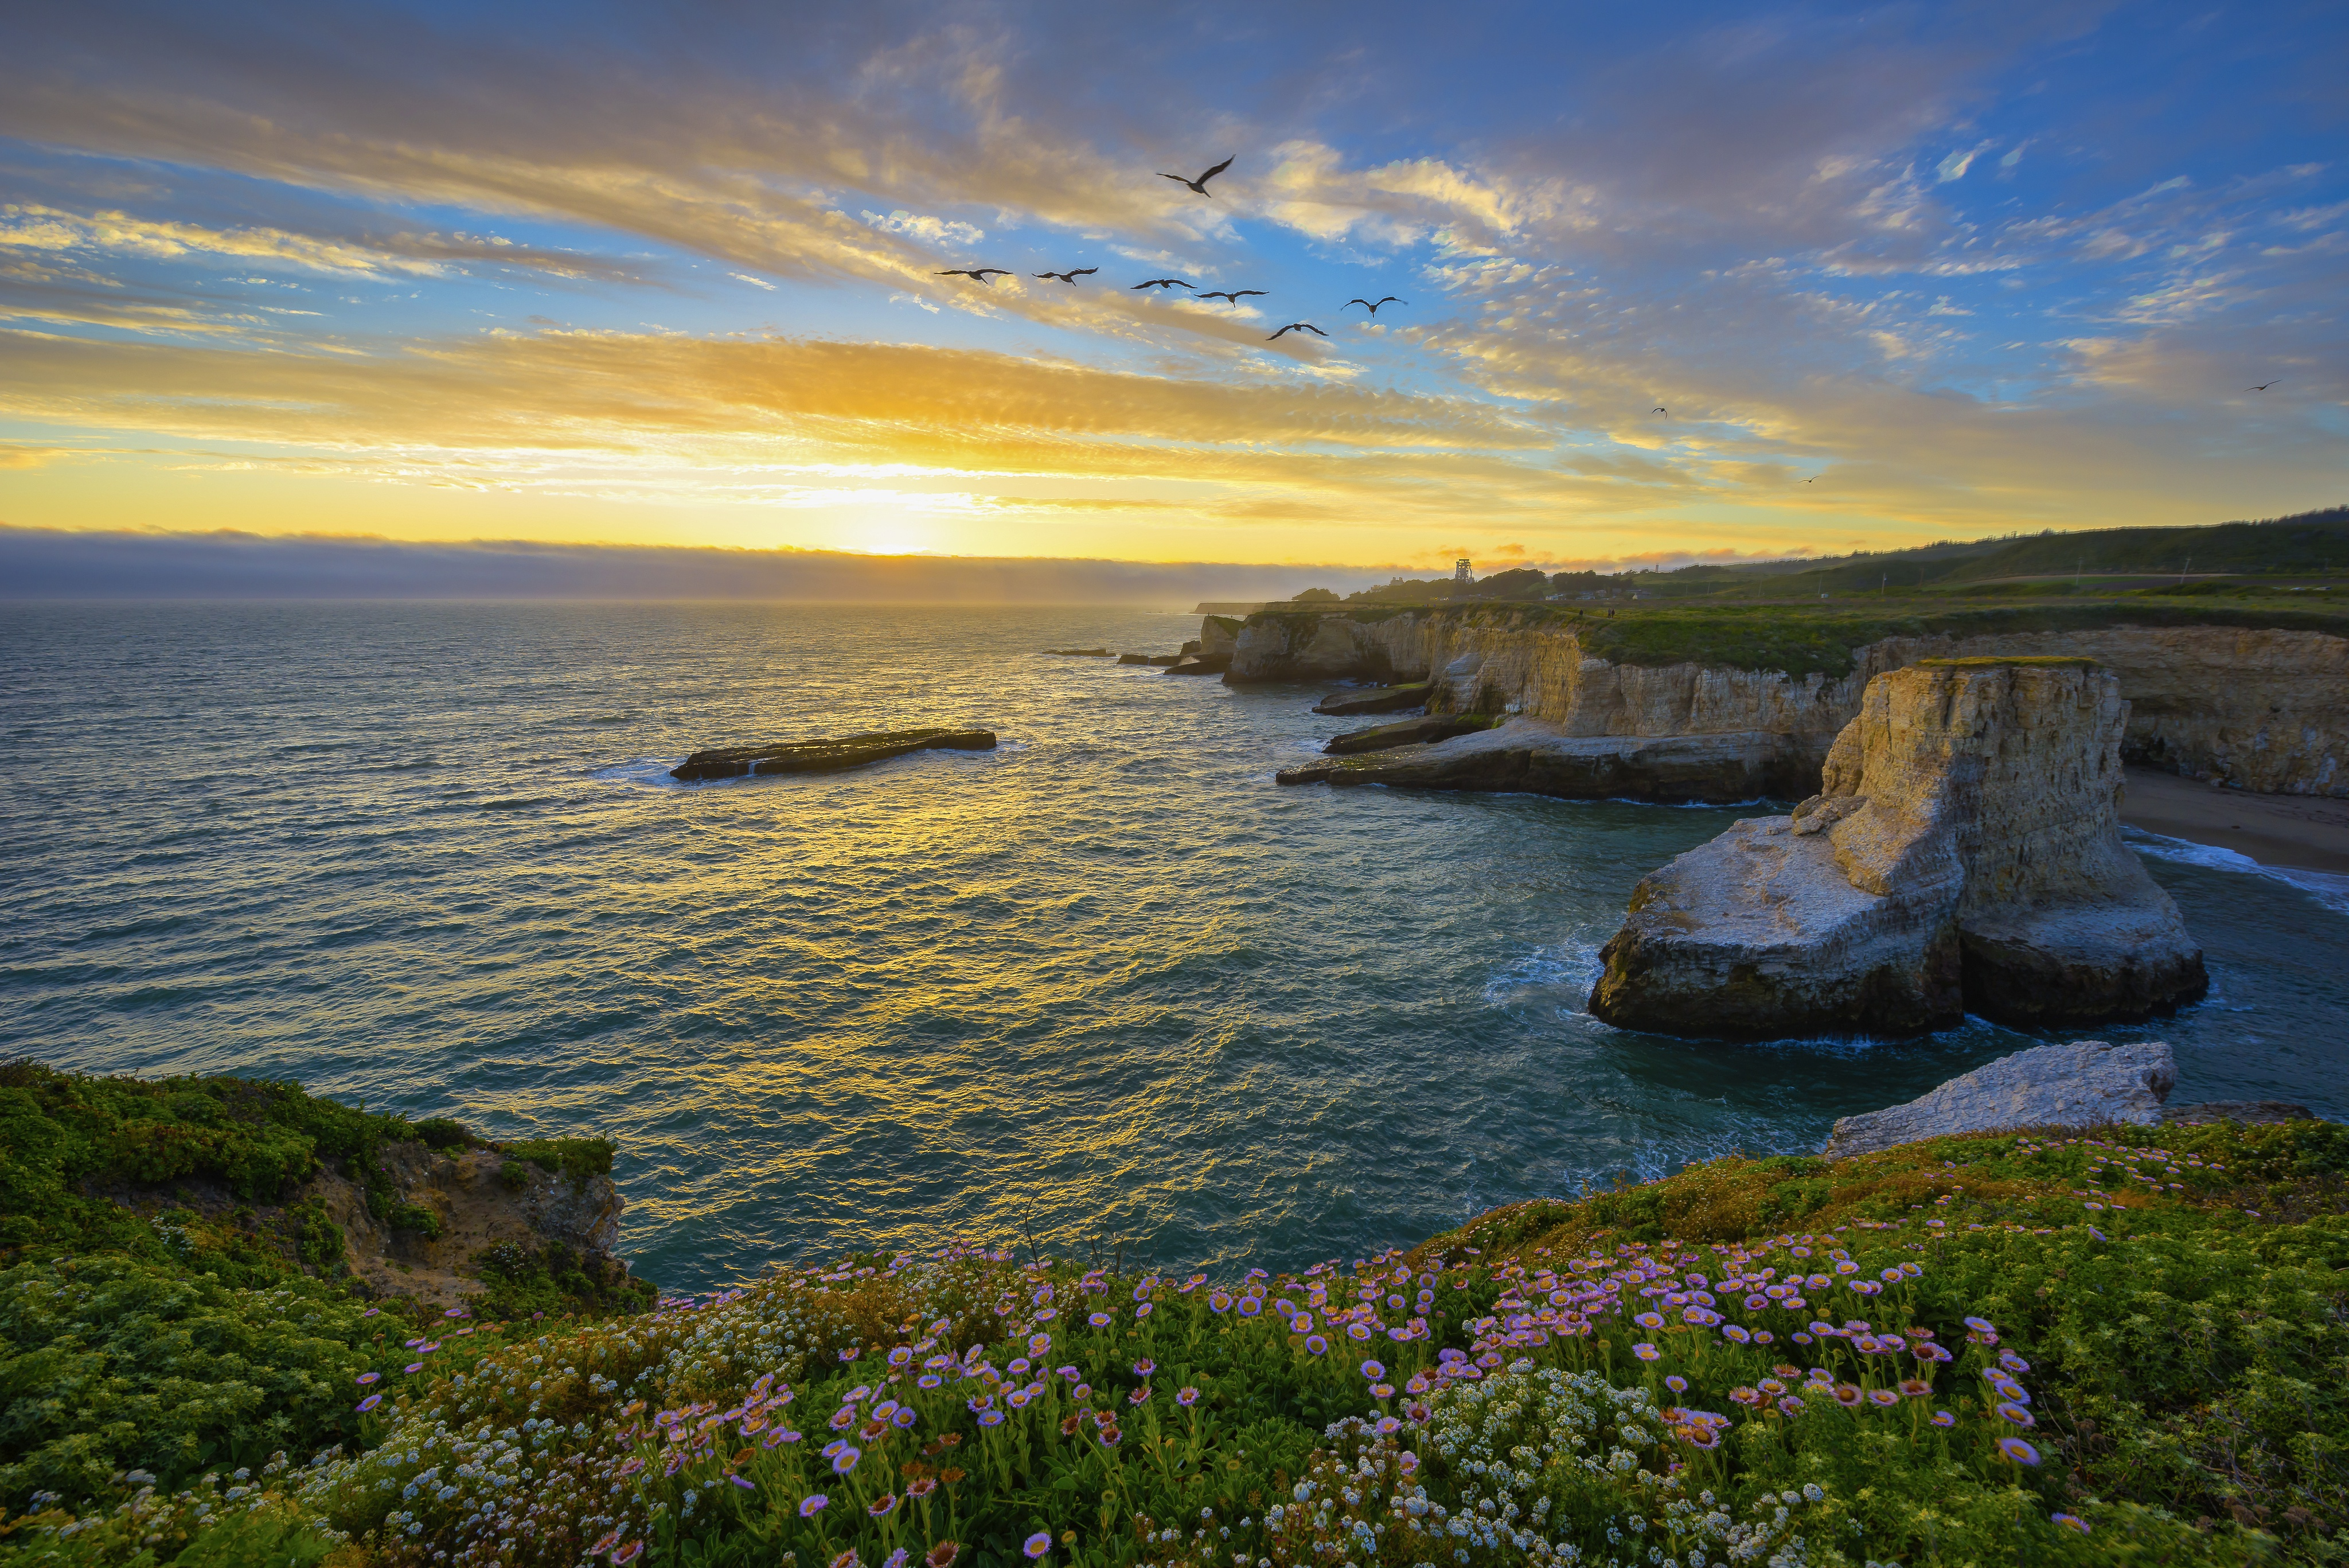 Bird California Coastline Flower Ocean Rock Santa Cruz Sunset Usa 4096x2734